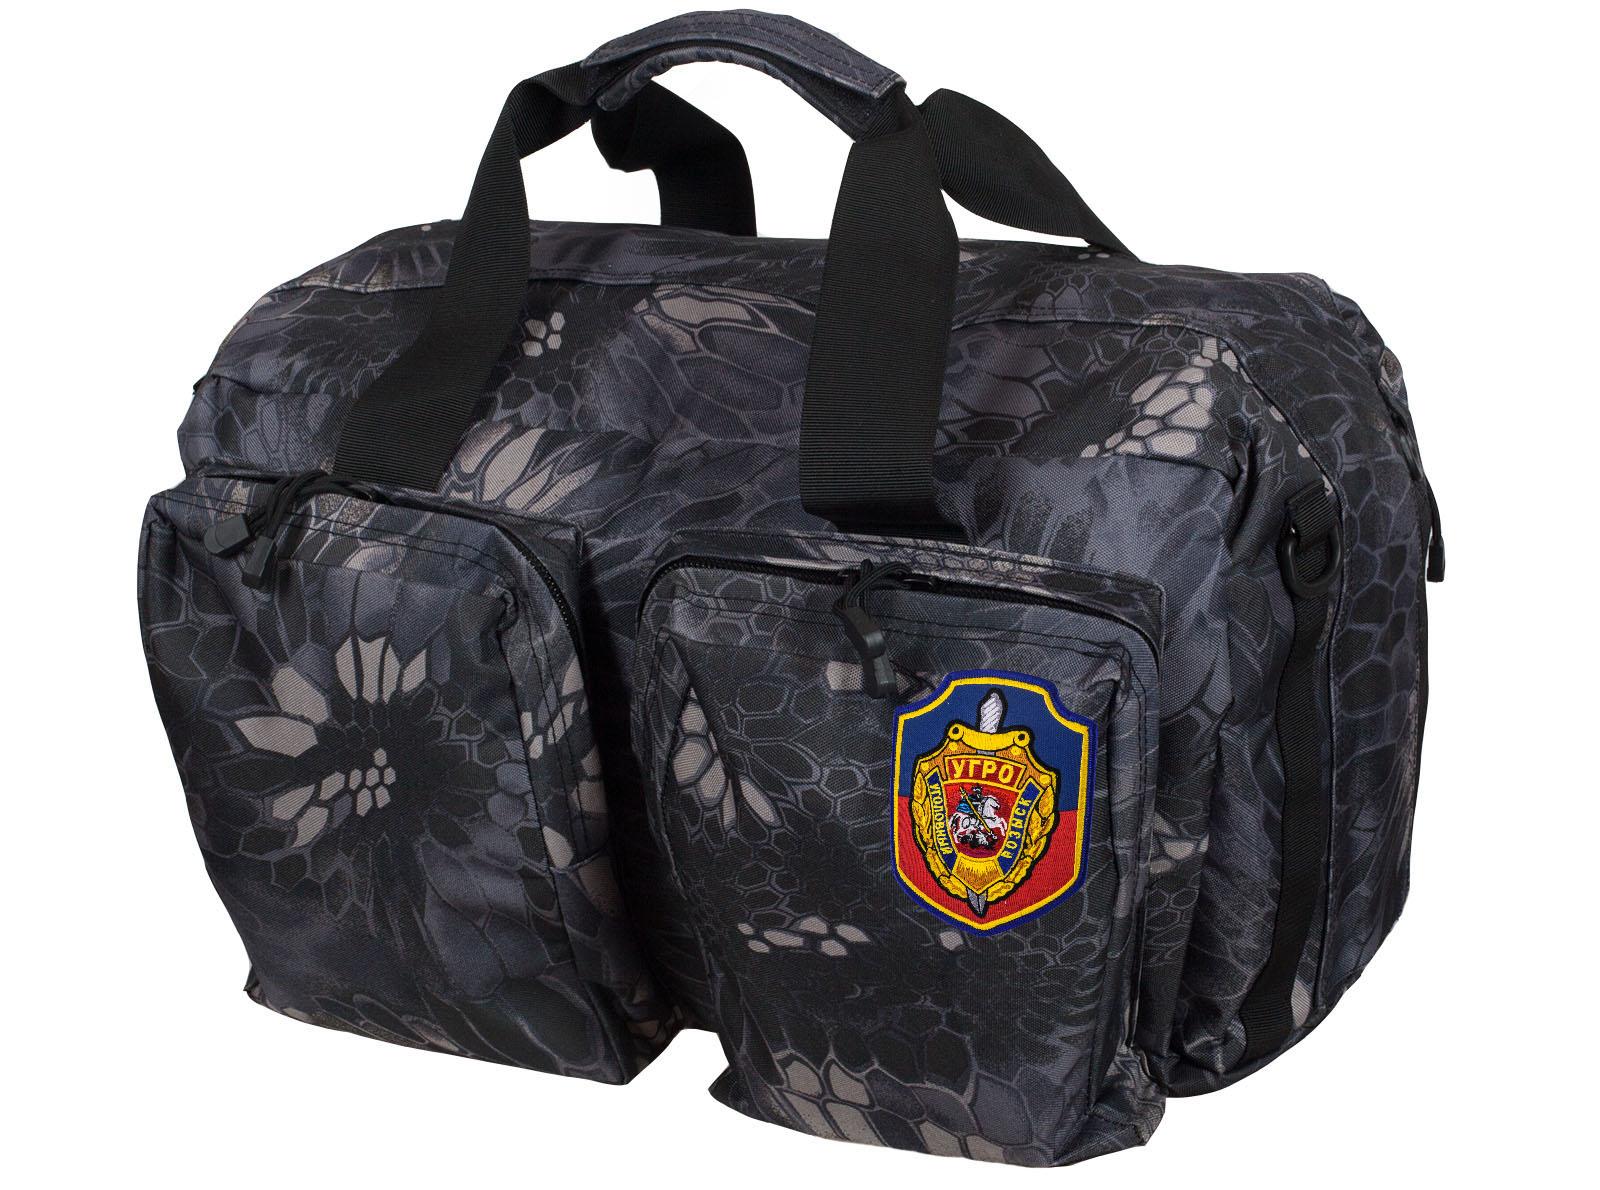 Мужская надежная сумка с нашивкой УГРО